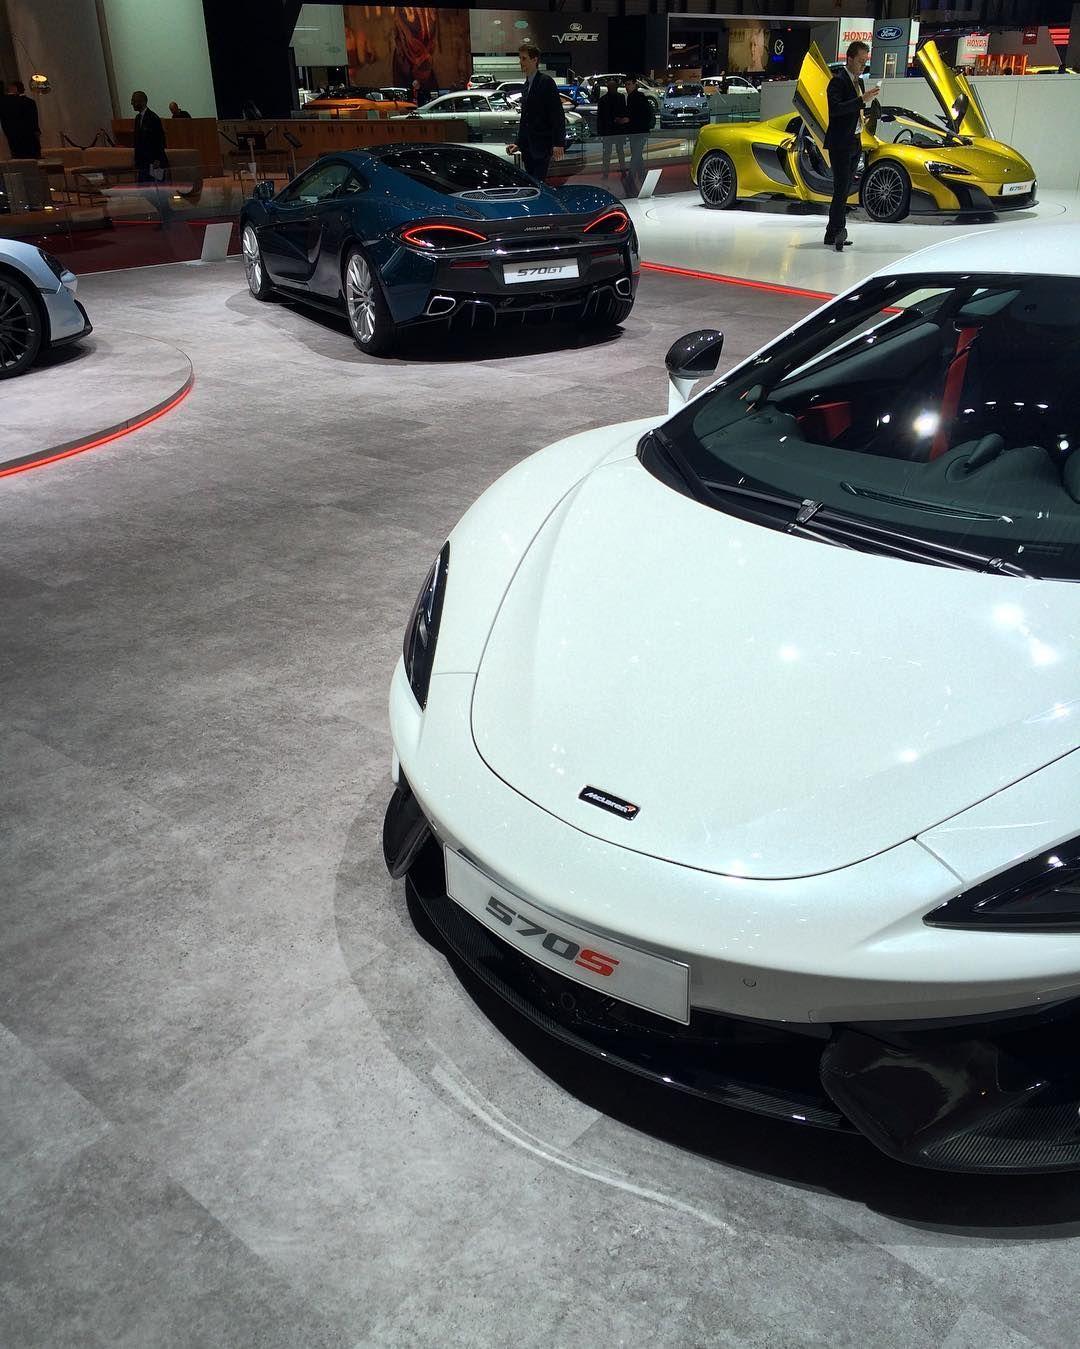 Luxury car rental chattanooga tn